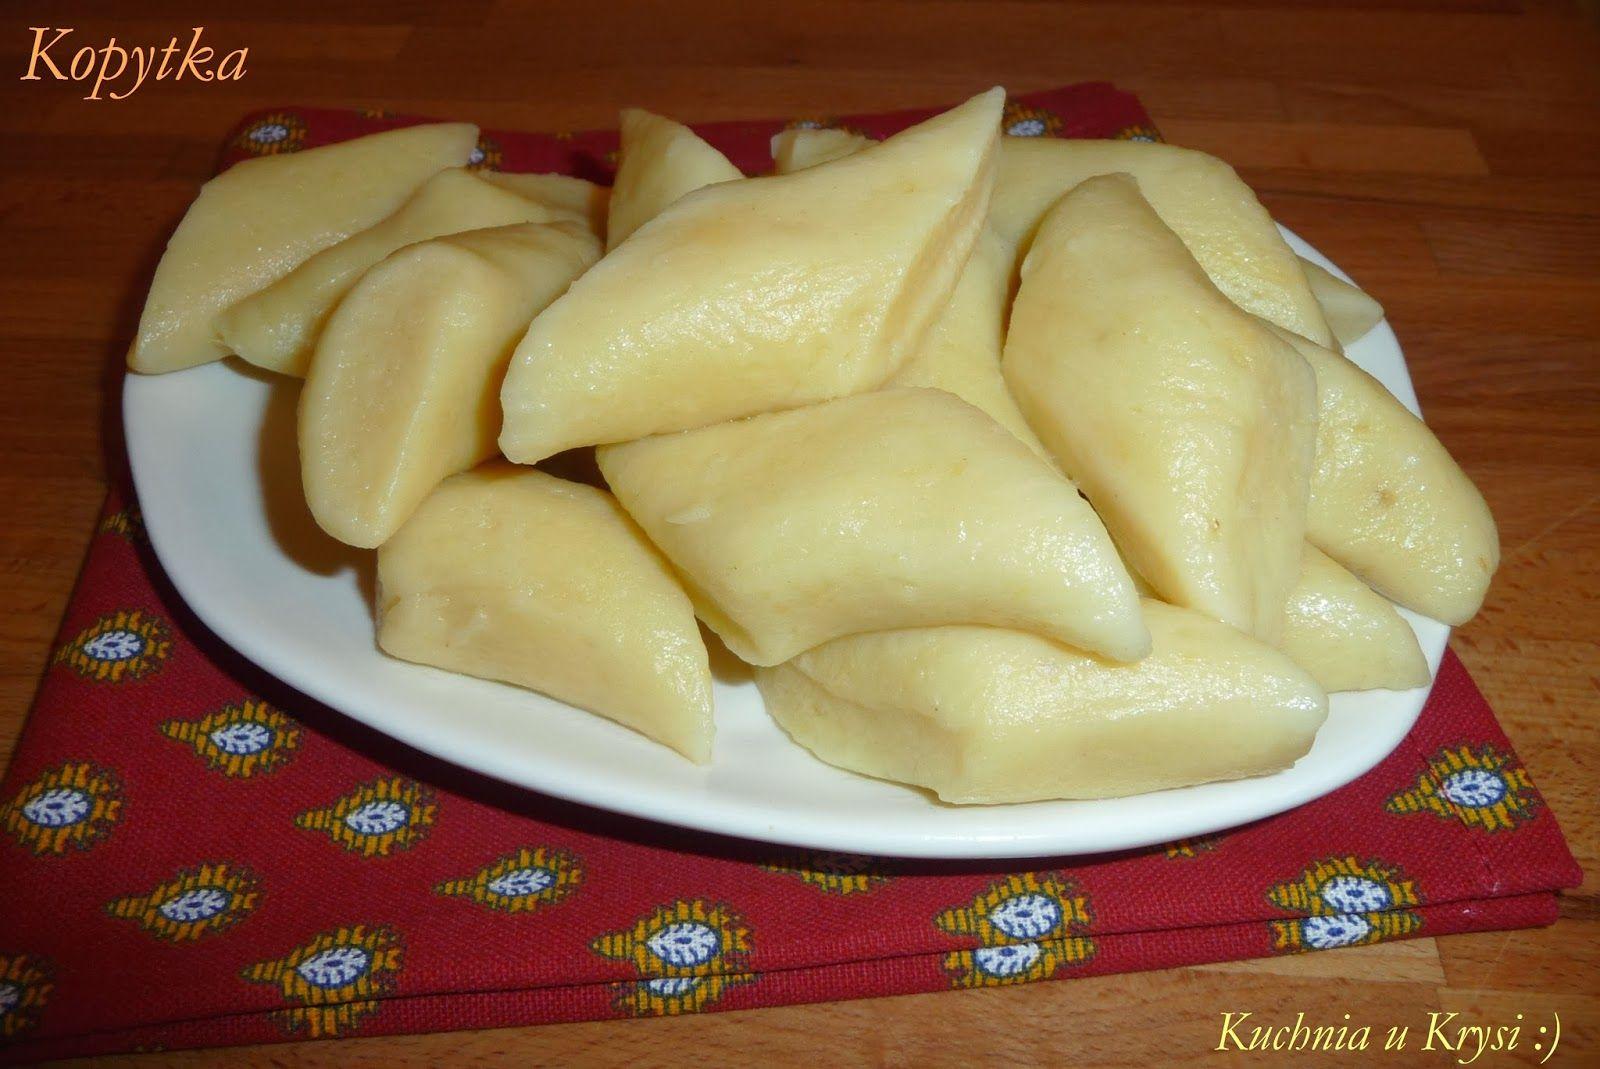 Kuchnia U Krysi Kopytka Przepis Niezawodny Recipes Cooking Recipes Food Recipies